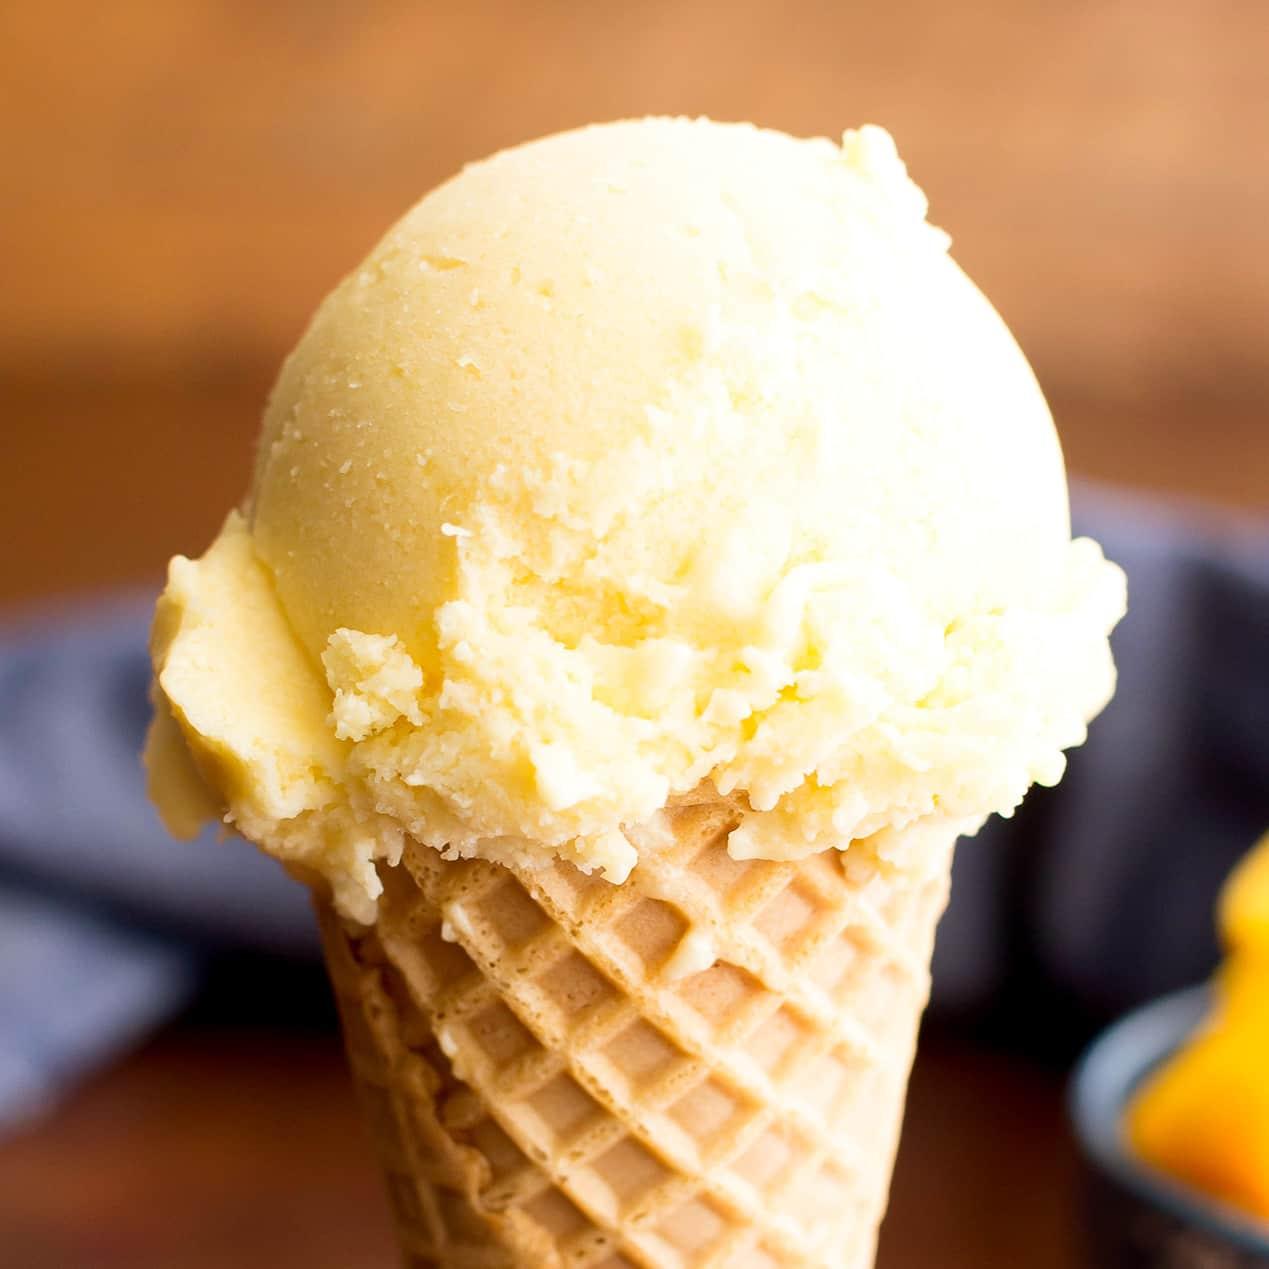 Homemade Mango Ice Cream: this 3 ingredient mango ice cream recipe is super EASY! 5 mins of prep for the best mango ice cream: rich & creamy with big mango flavor! Vegan, Dairy-Free, Healthy. #Mango #IceCream #Vegan #DairyFree | Recipe at BeamingBaker.com